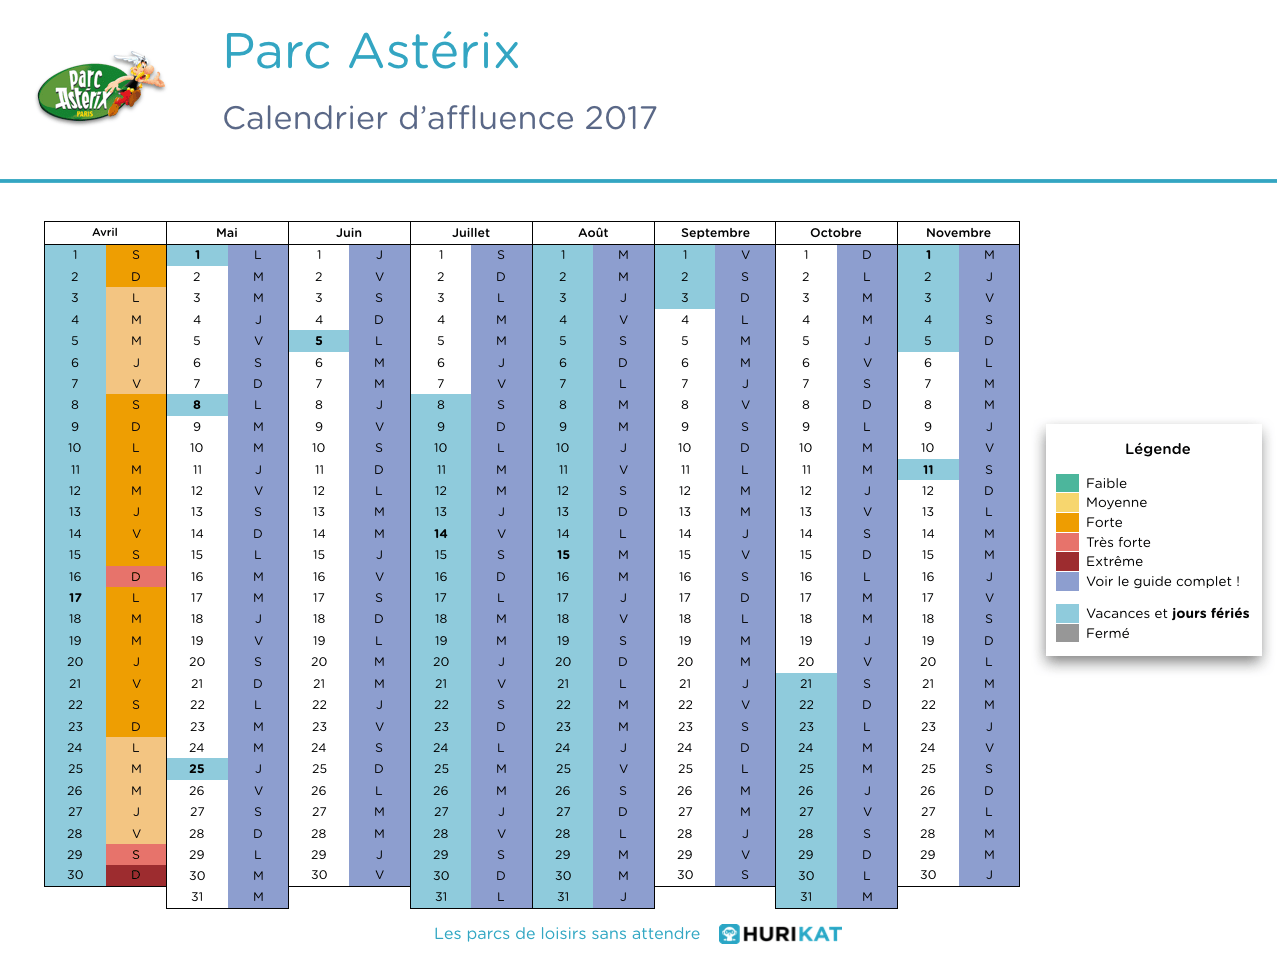 Calendrier d'affluence 2017 Parc Astérix